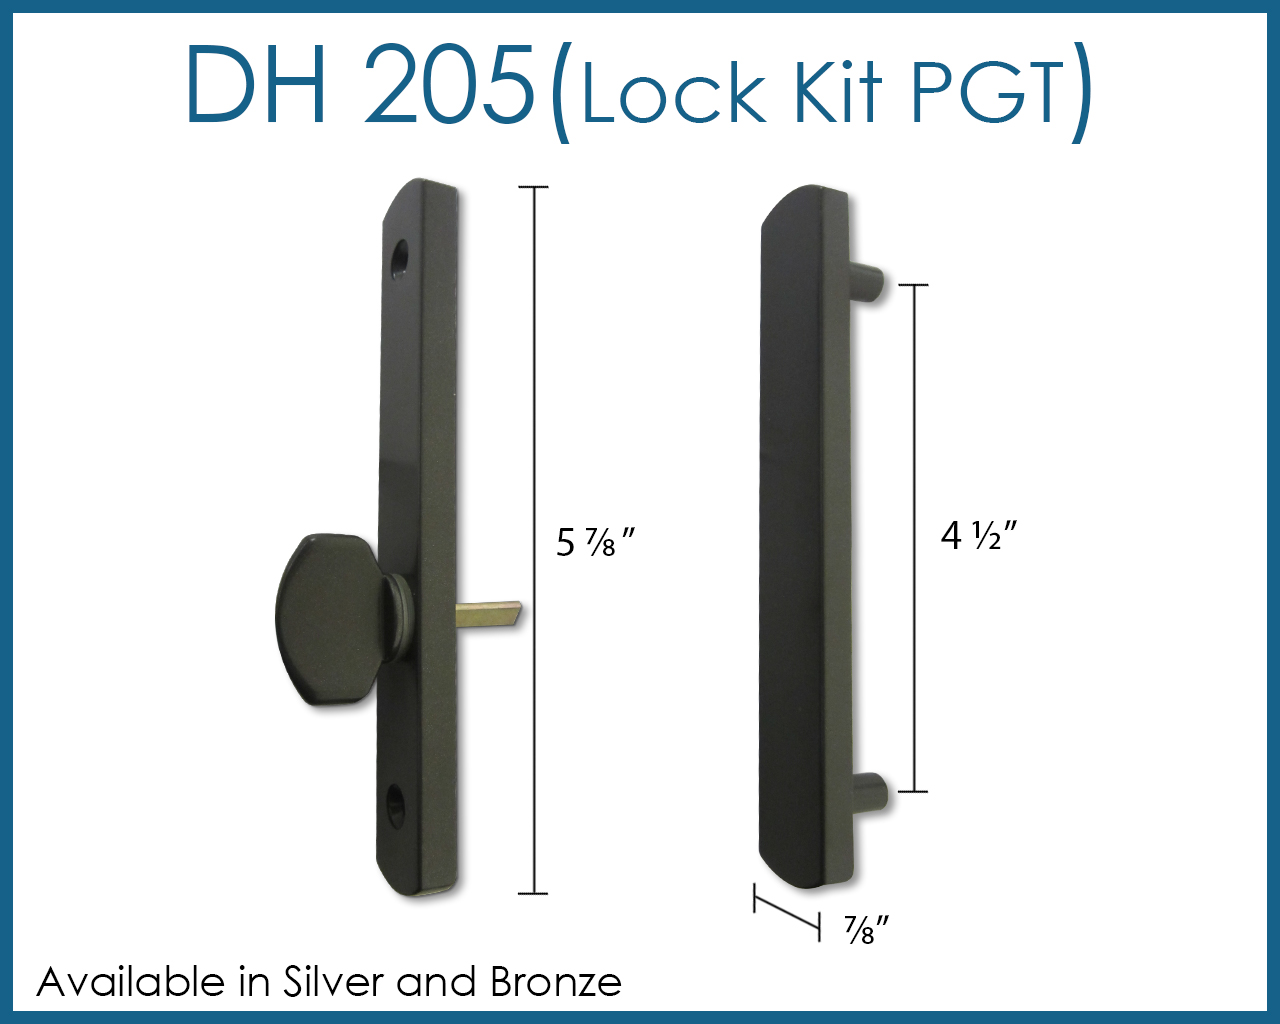 Sliding Glass Doors Window Parts Warehouse Pgt Handle Lock Kit